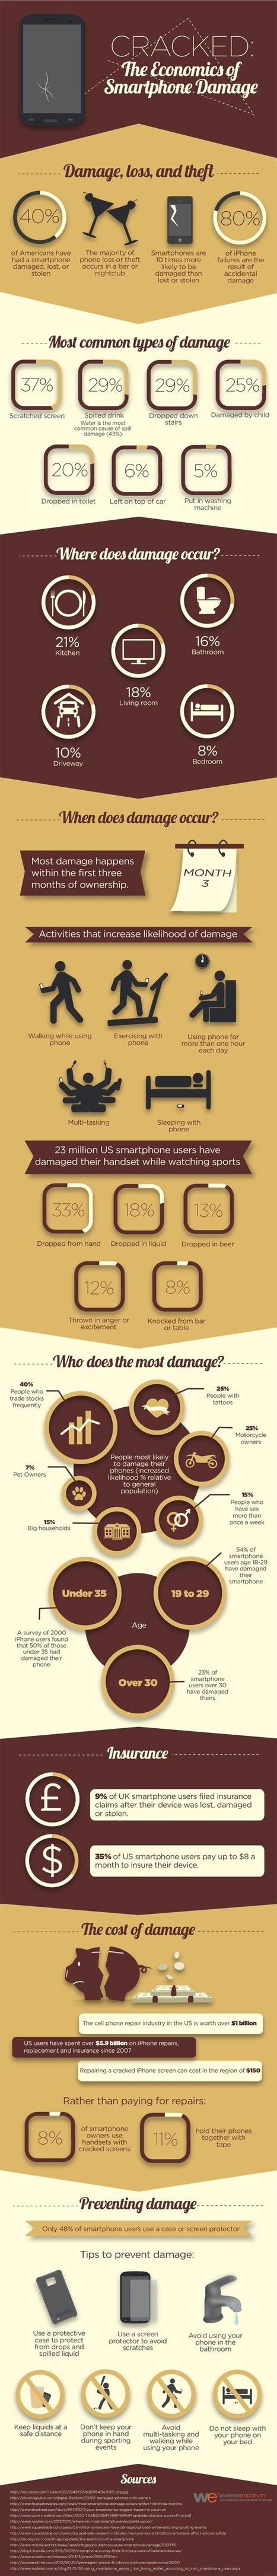 The Economics of Smartphone Damage #infographic | MarketingHits | Scoop.it